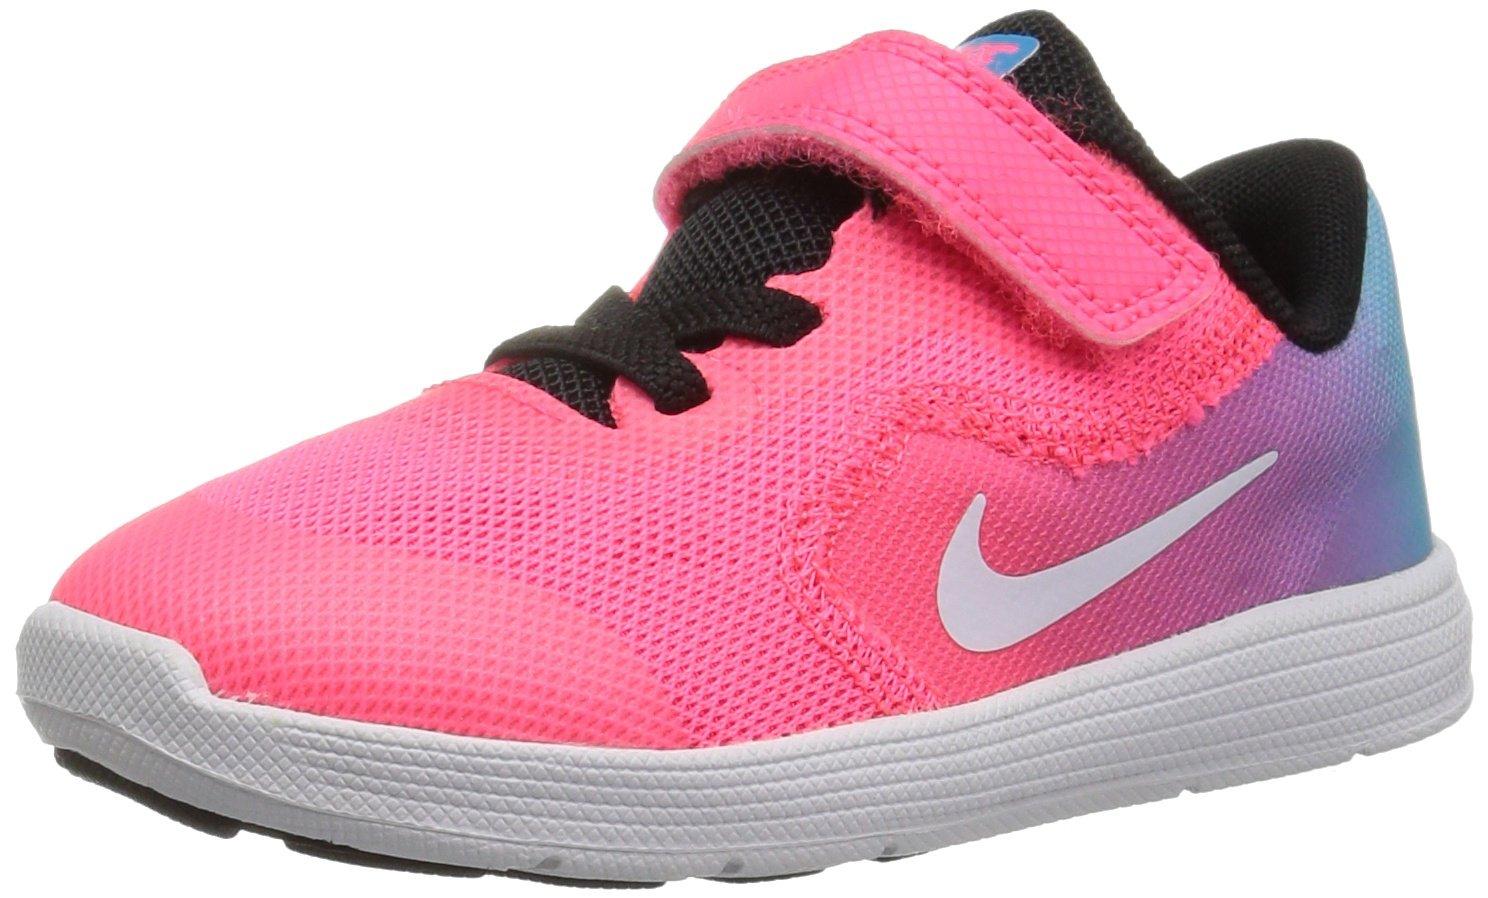 NIKE Kids' Revolution 3 (TDV) Running Shoe, Chlorine Blue/White/Racer Pink/Black, 9 M US Toddler